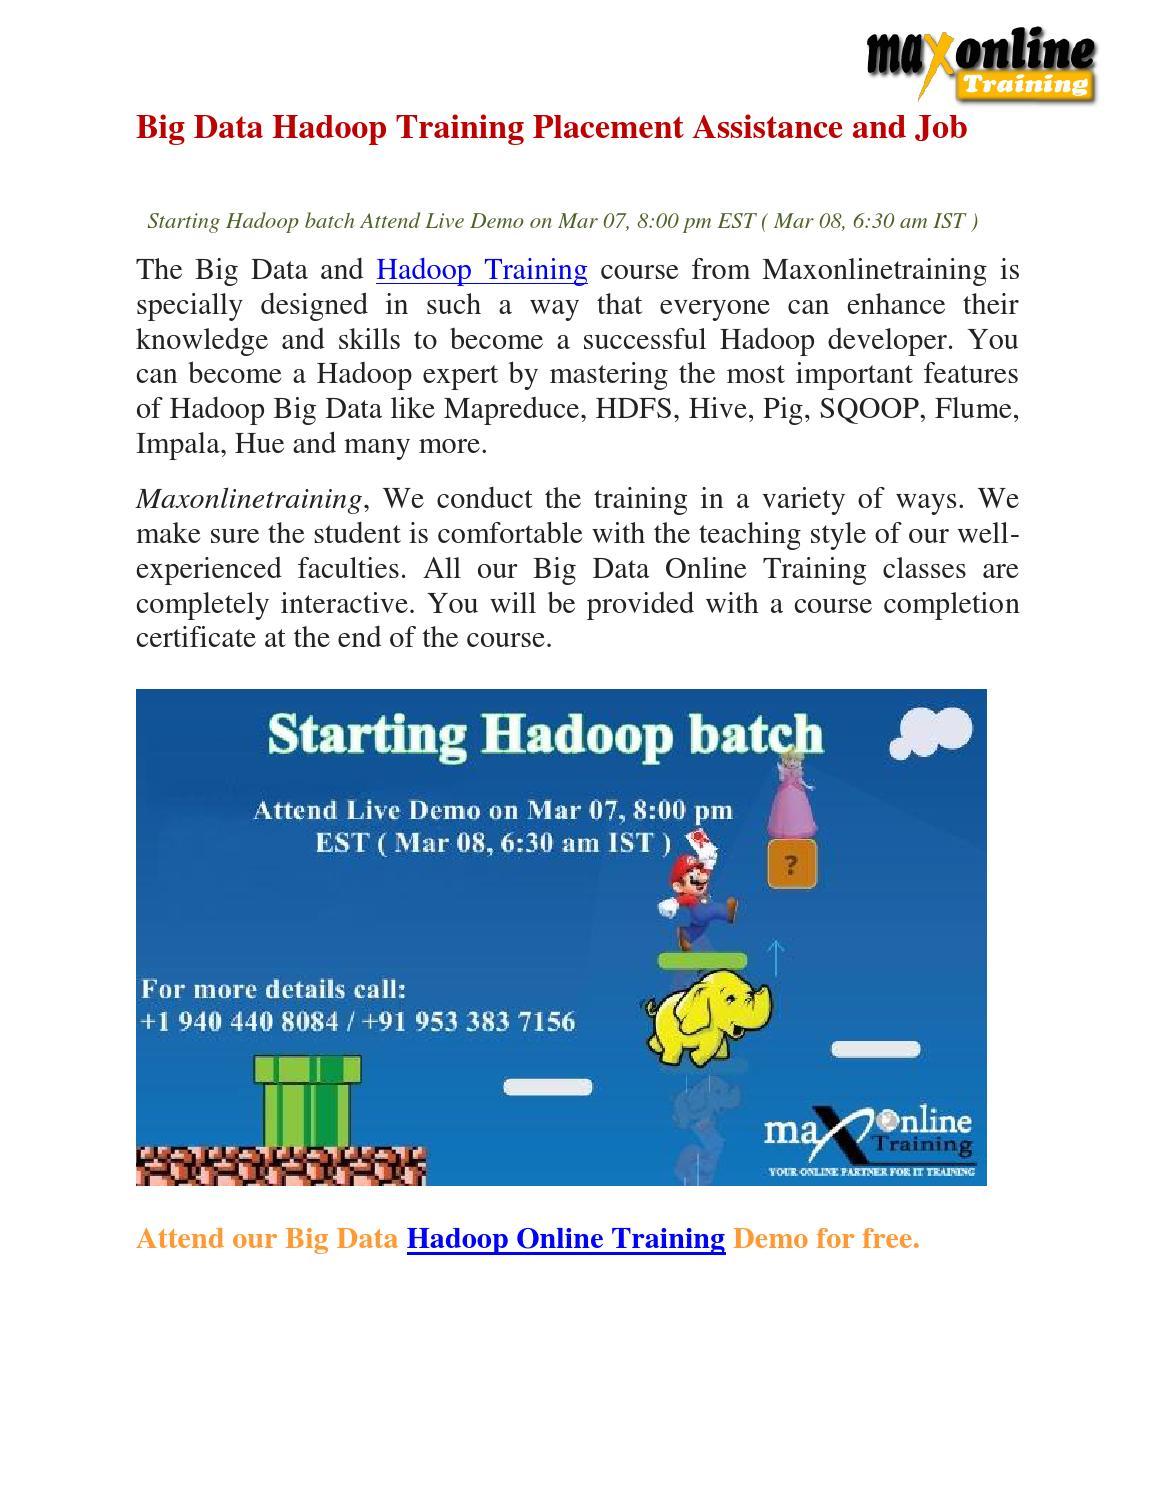 Big Data Hadoop Sample Resume Live Online Training of - mandegar.info